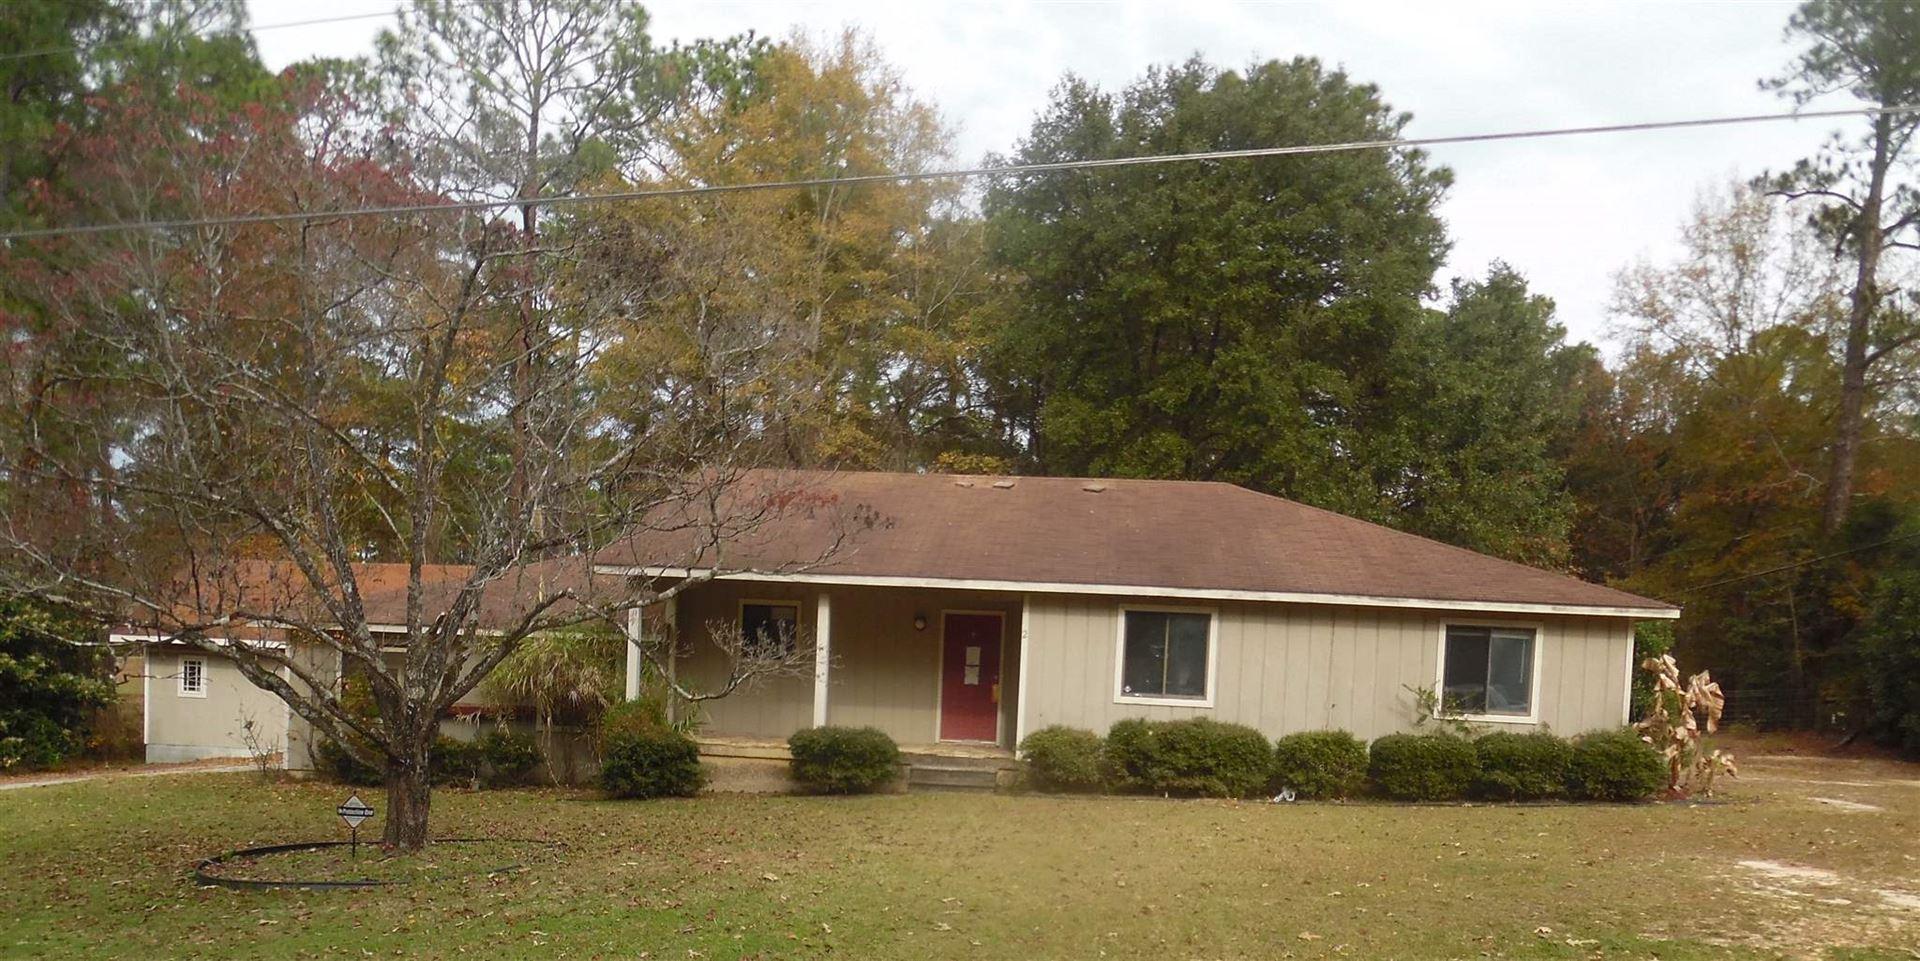 2 Jef Rd, Statesboro, GA 30458 - #: 8705821